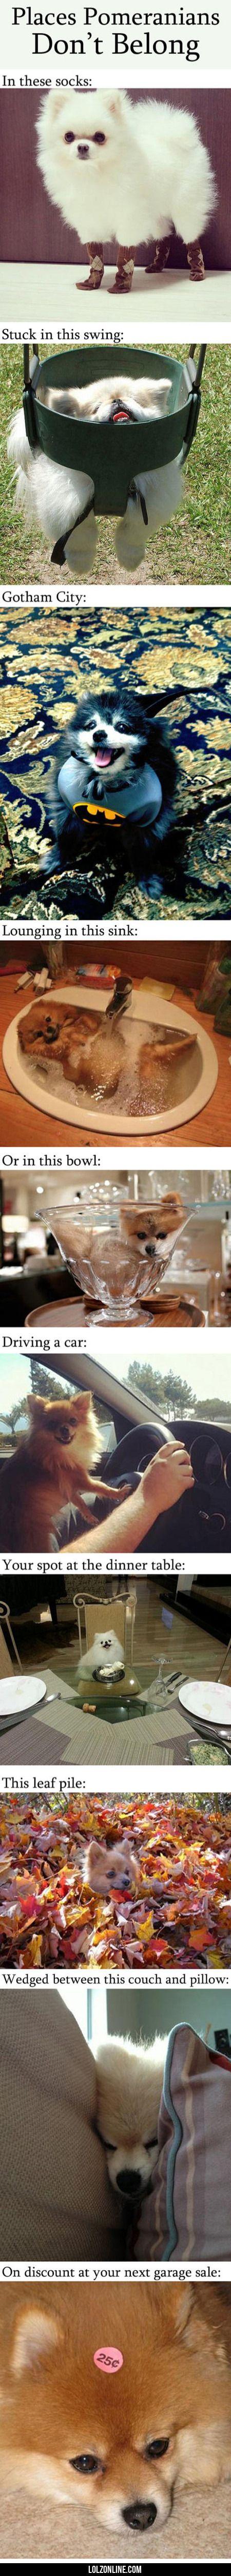 Places Where Pomeranians Don't Belong #lol #haha #funny